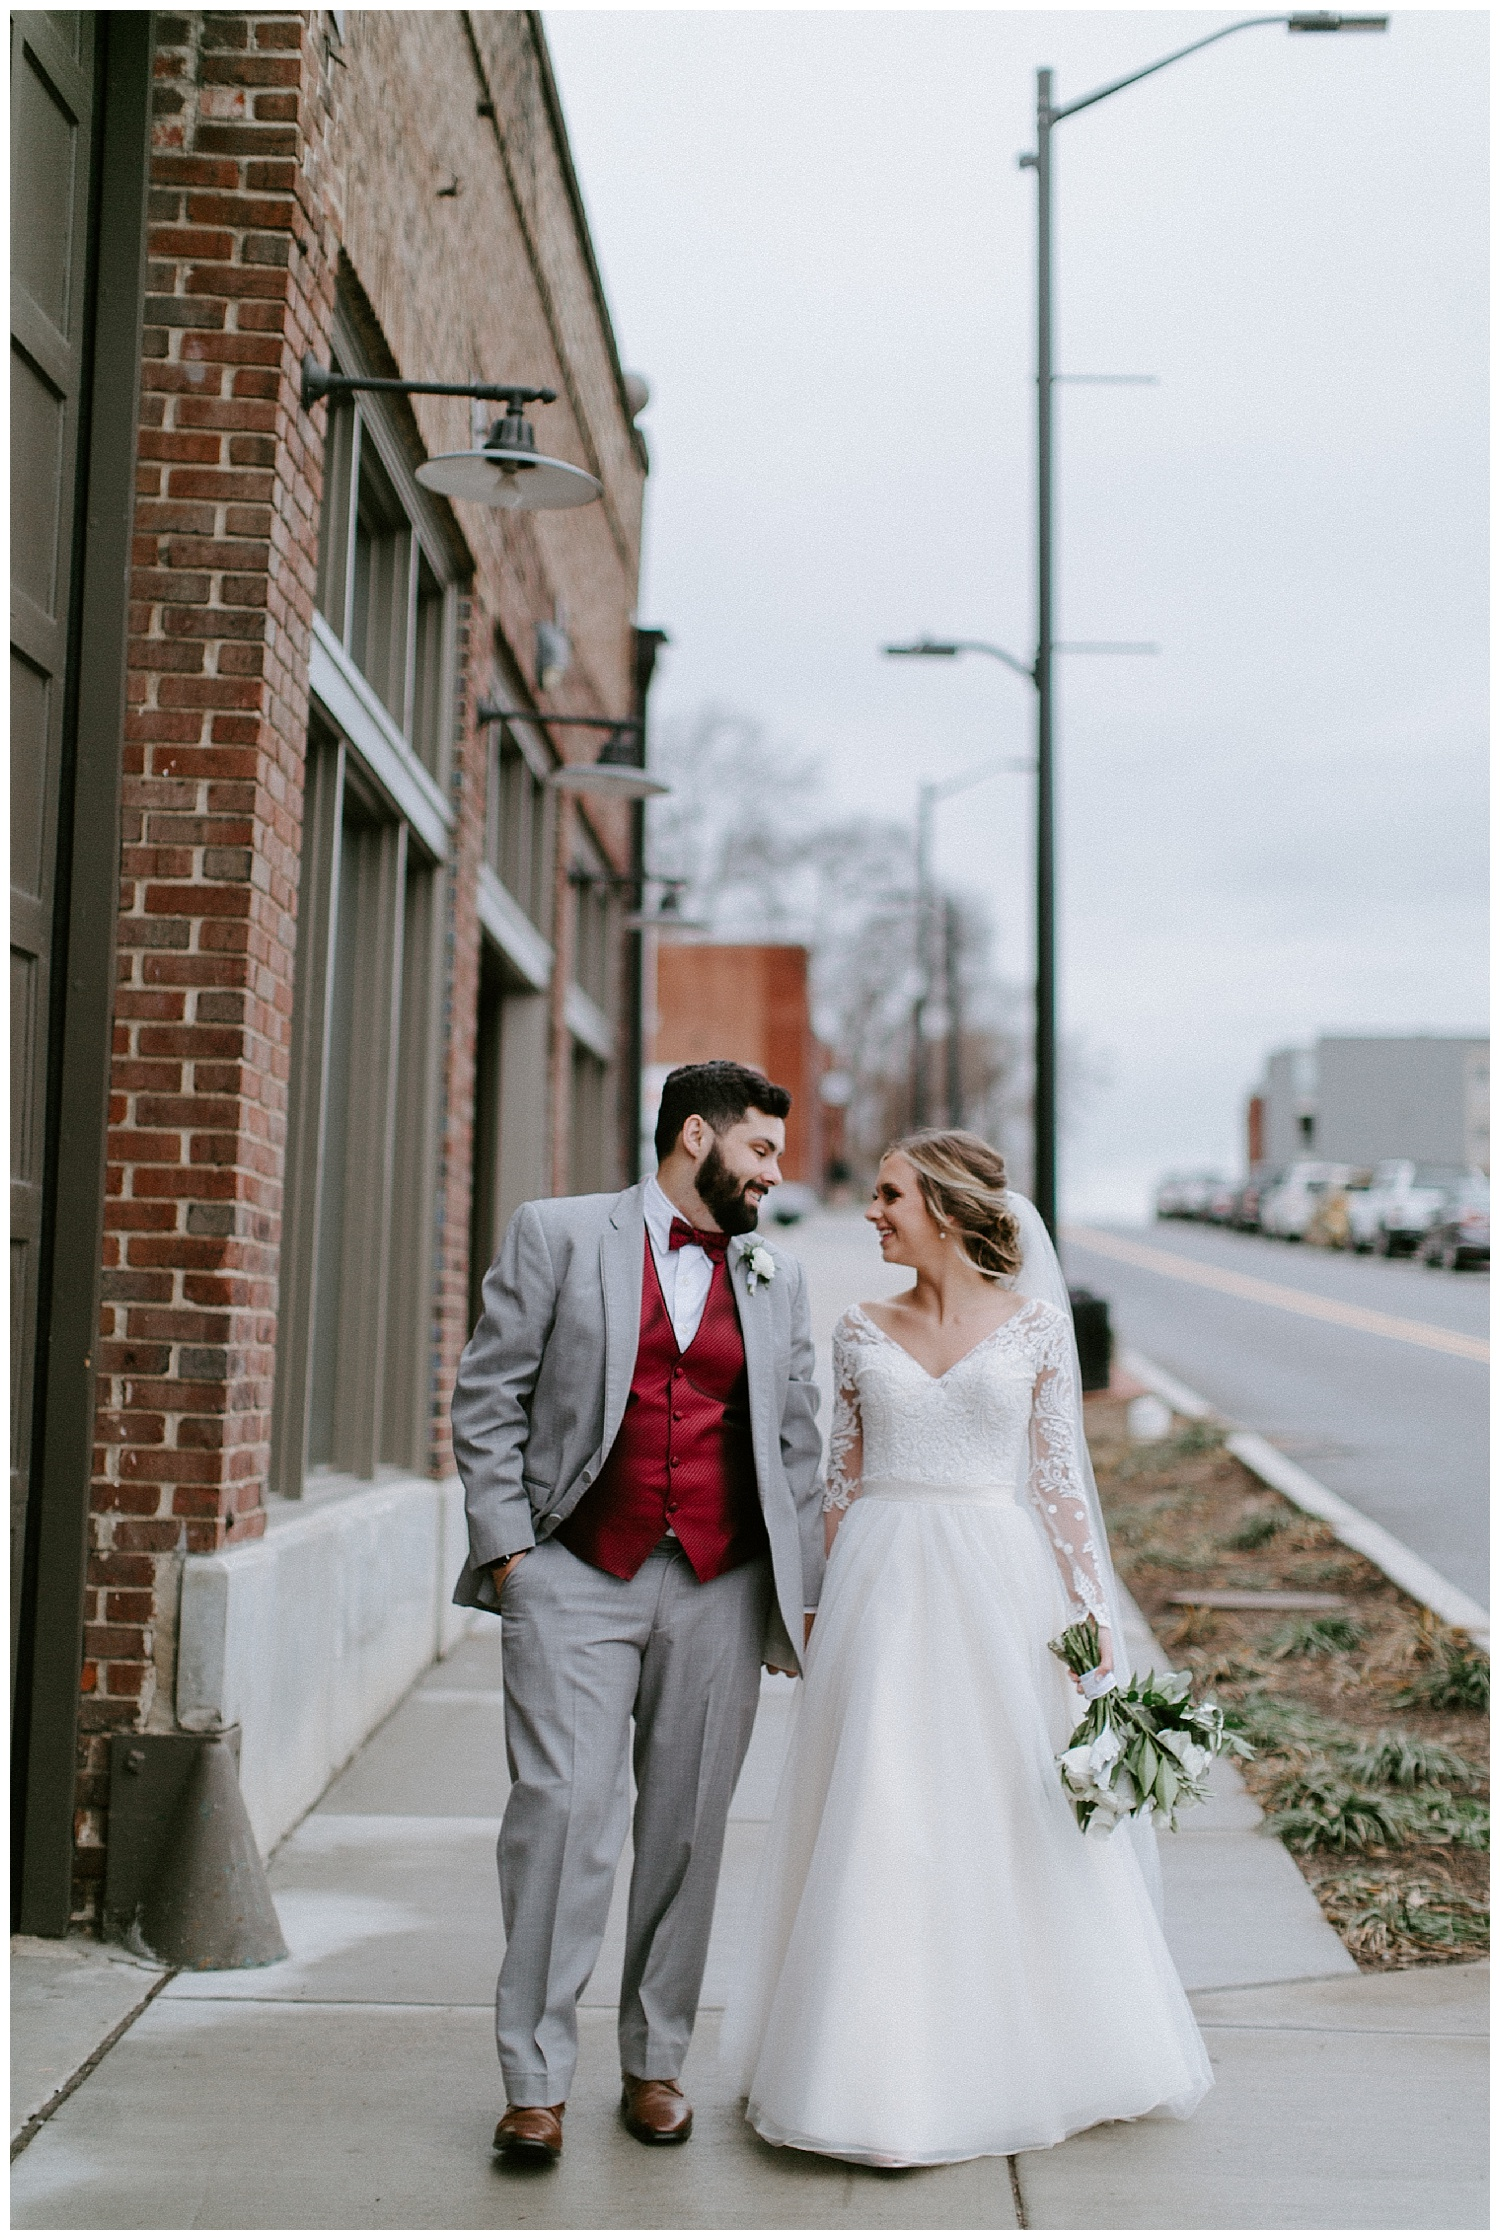 winter-wedding-the standard-knoxville_2019-01-23_0051.jpg